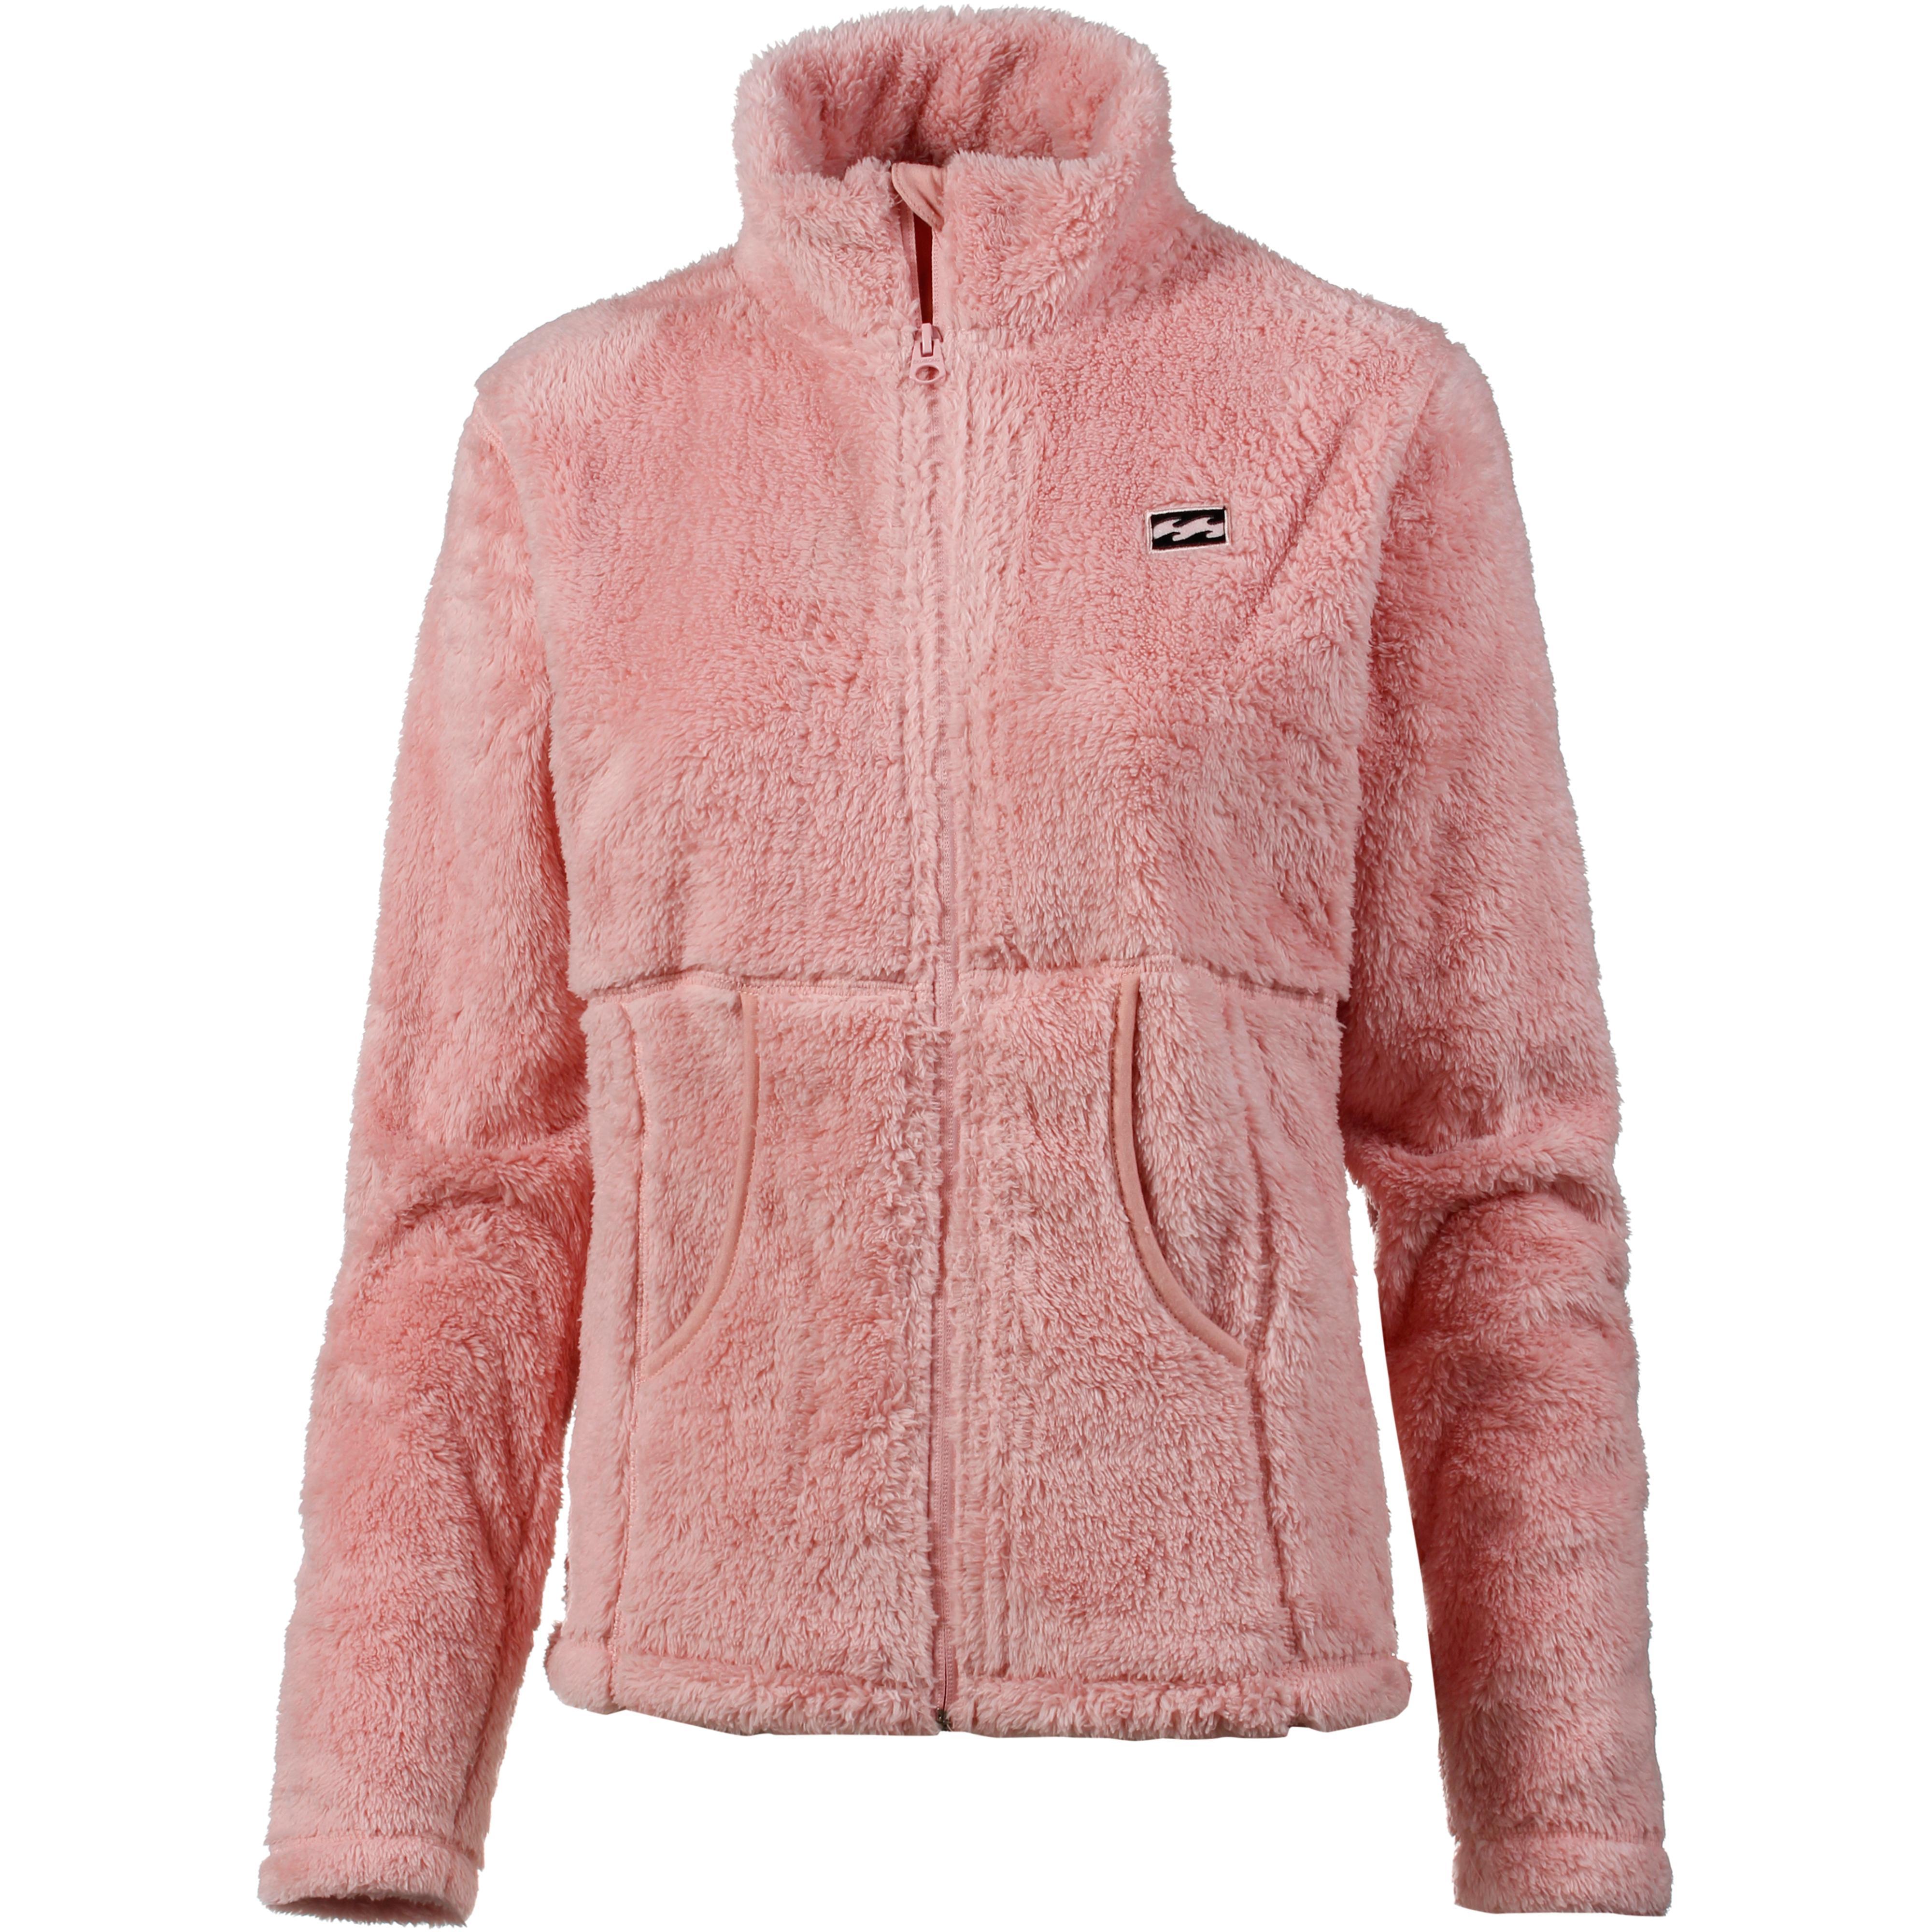 Fleecejacke rosa damen